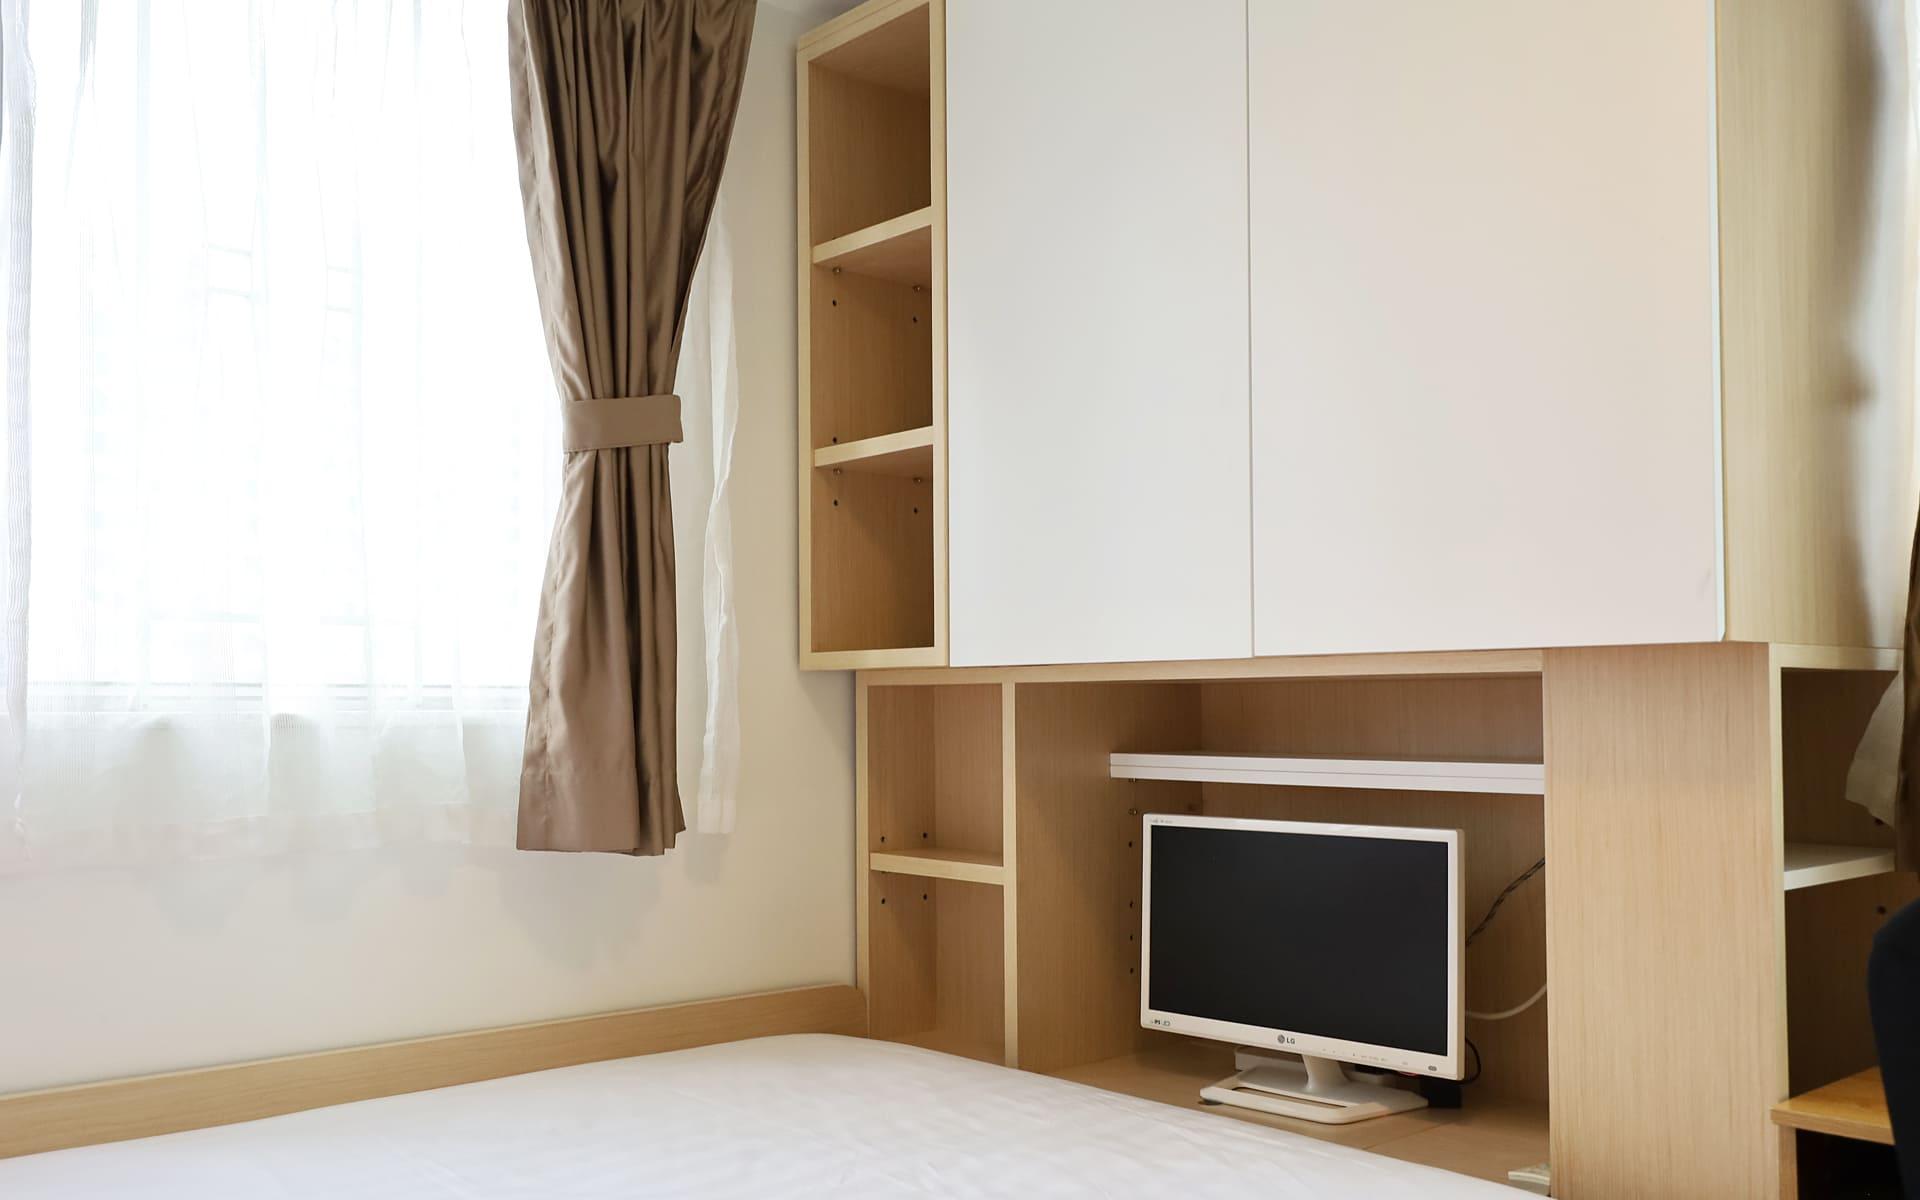 hk_service_apartment_16170424011596694985.jpg